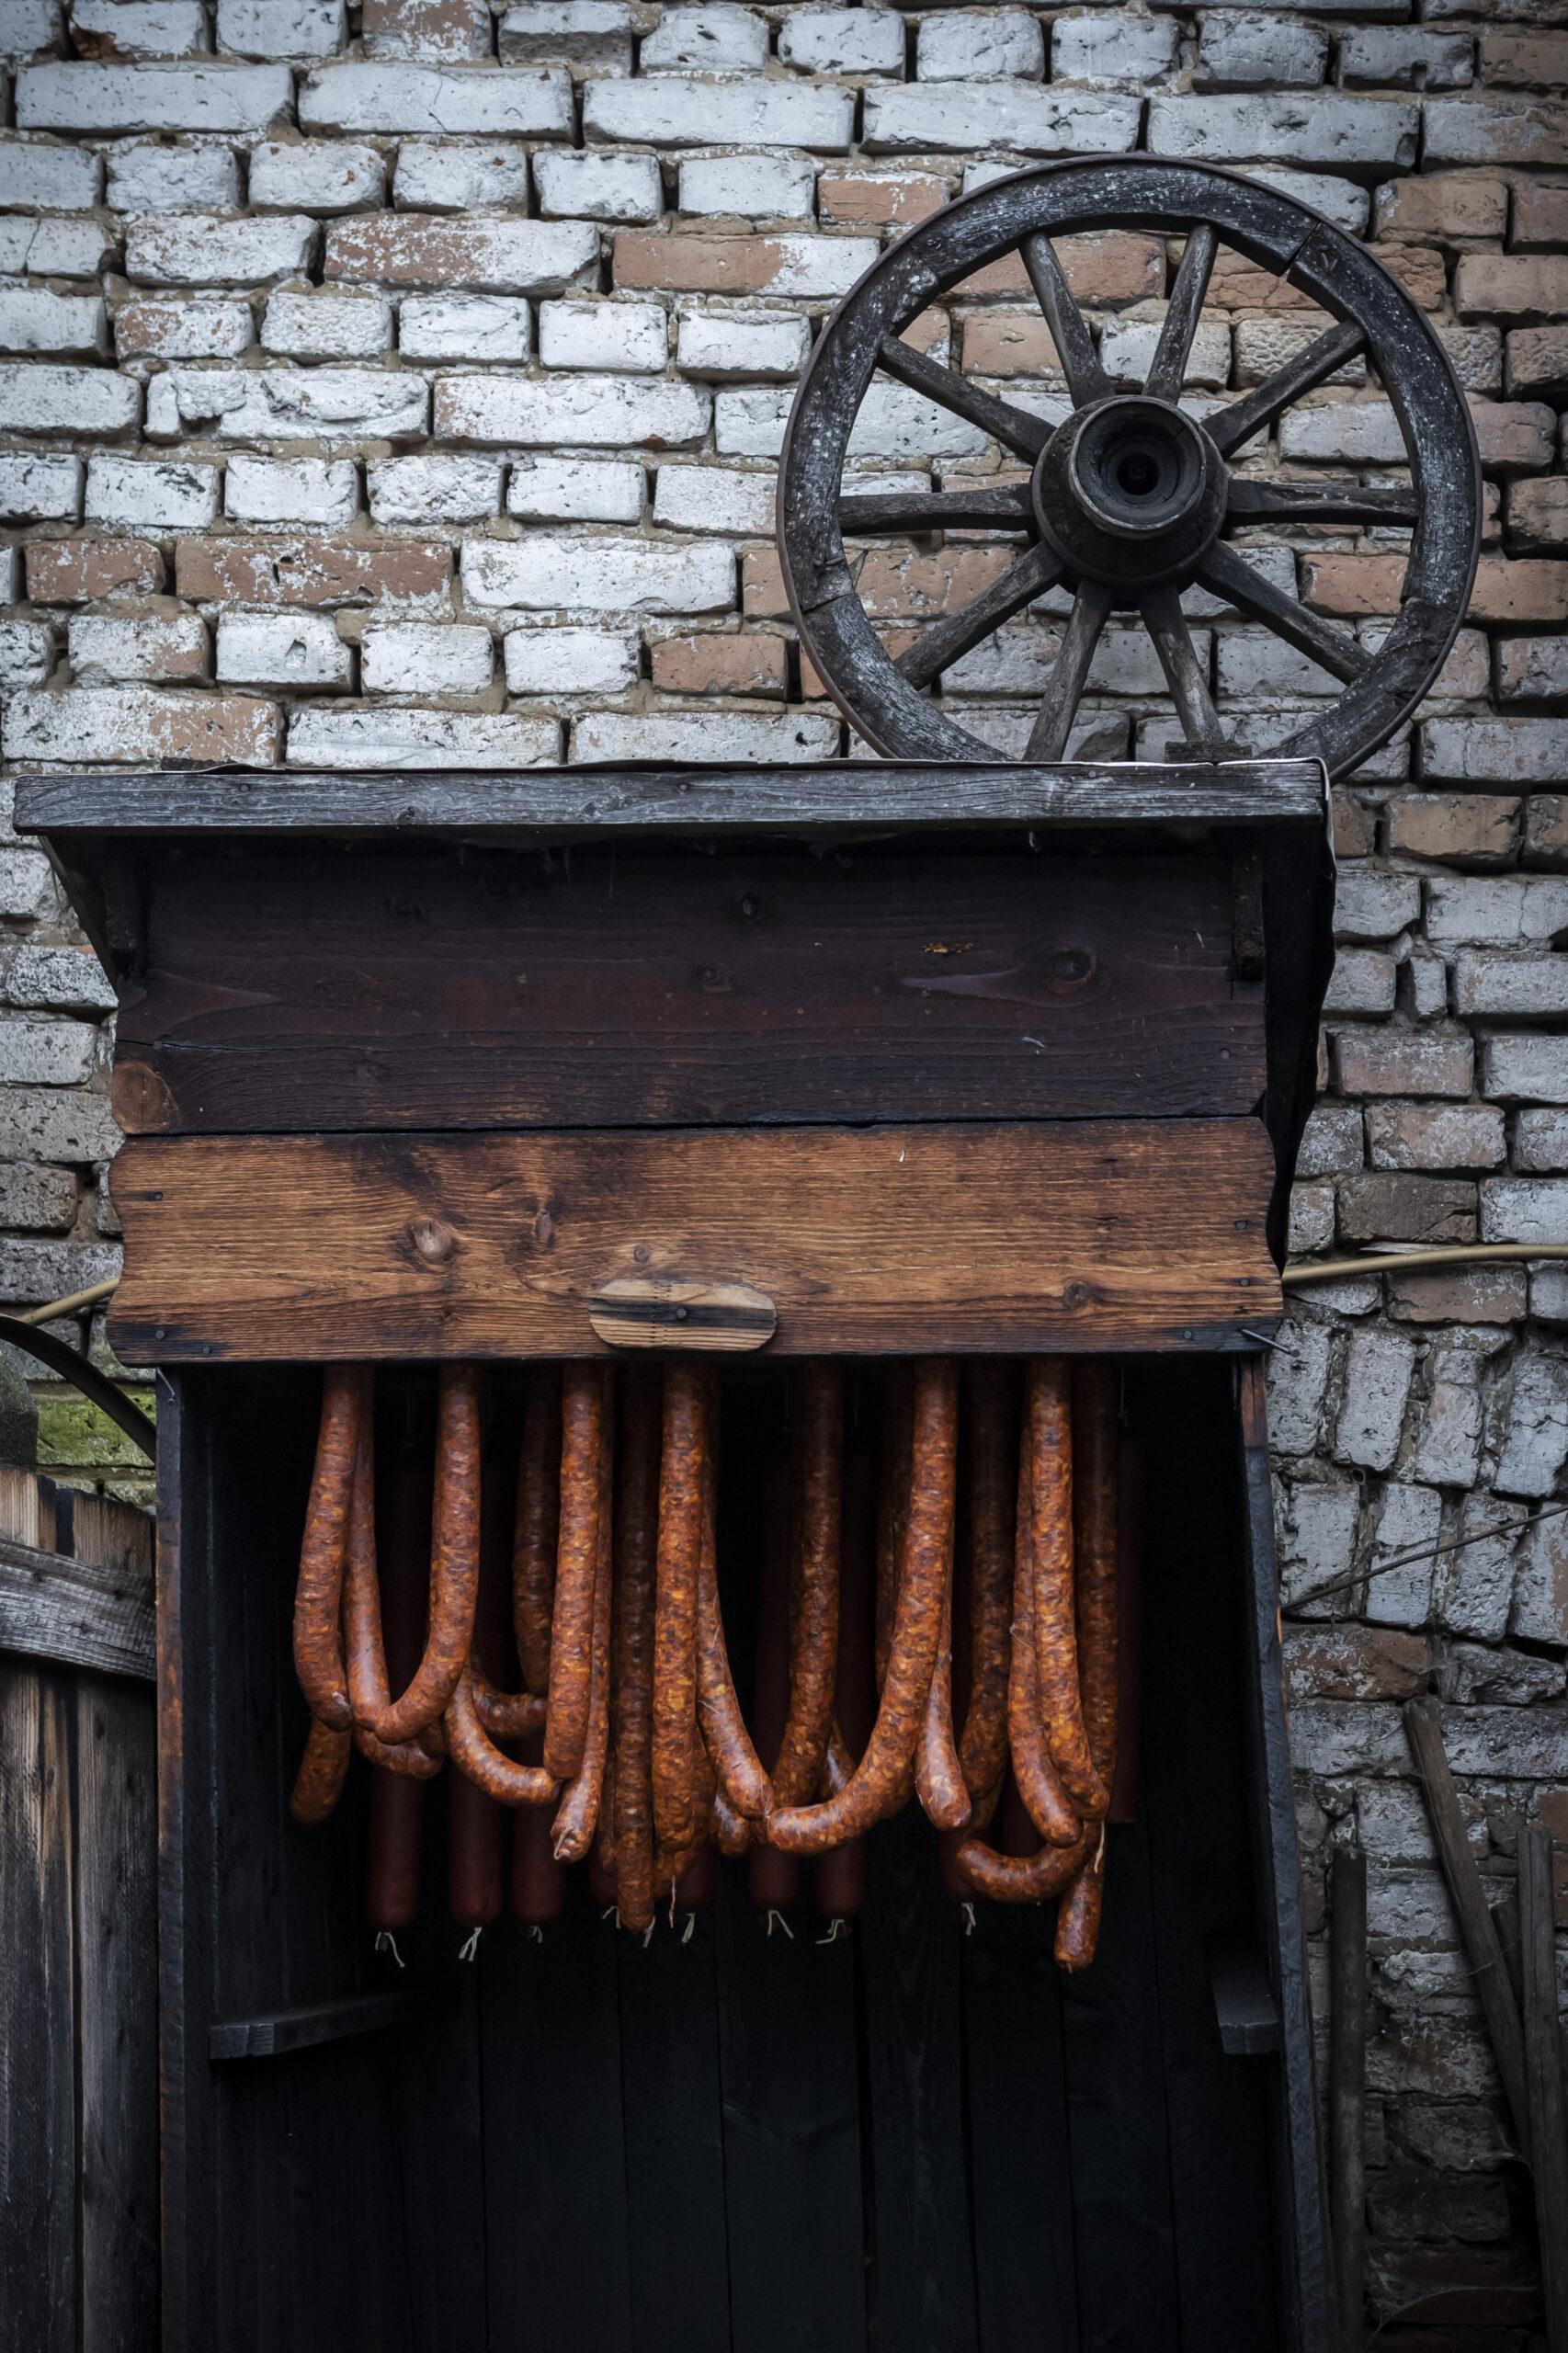 Pig sausages